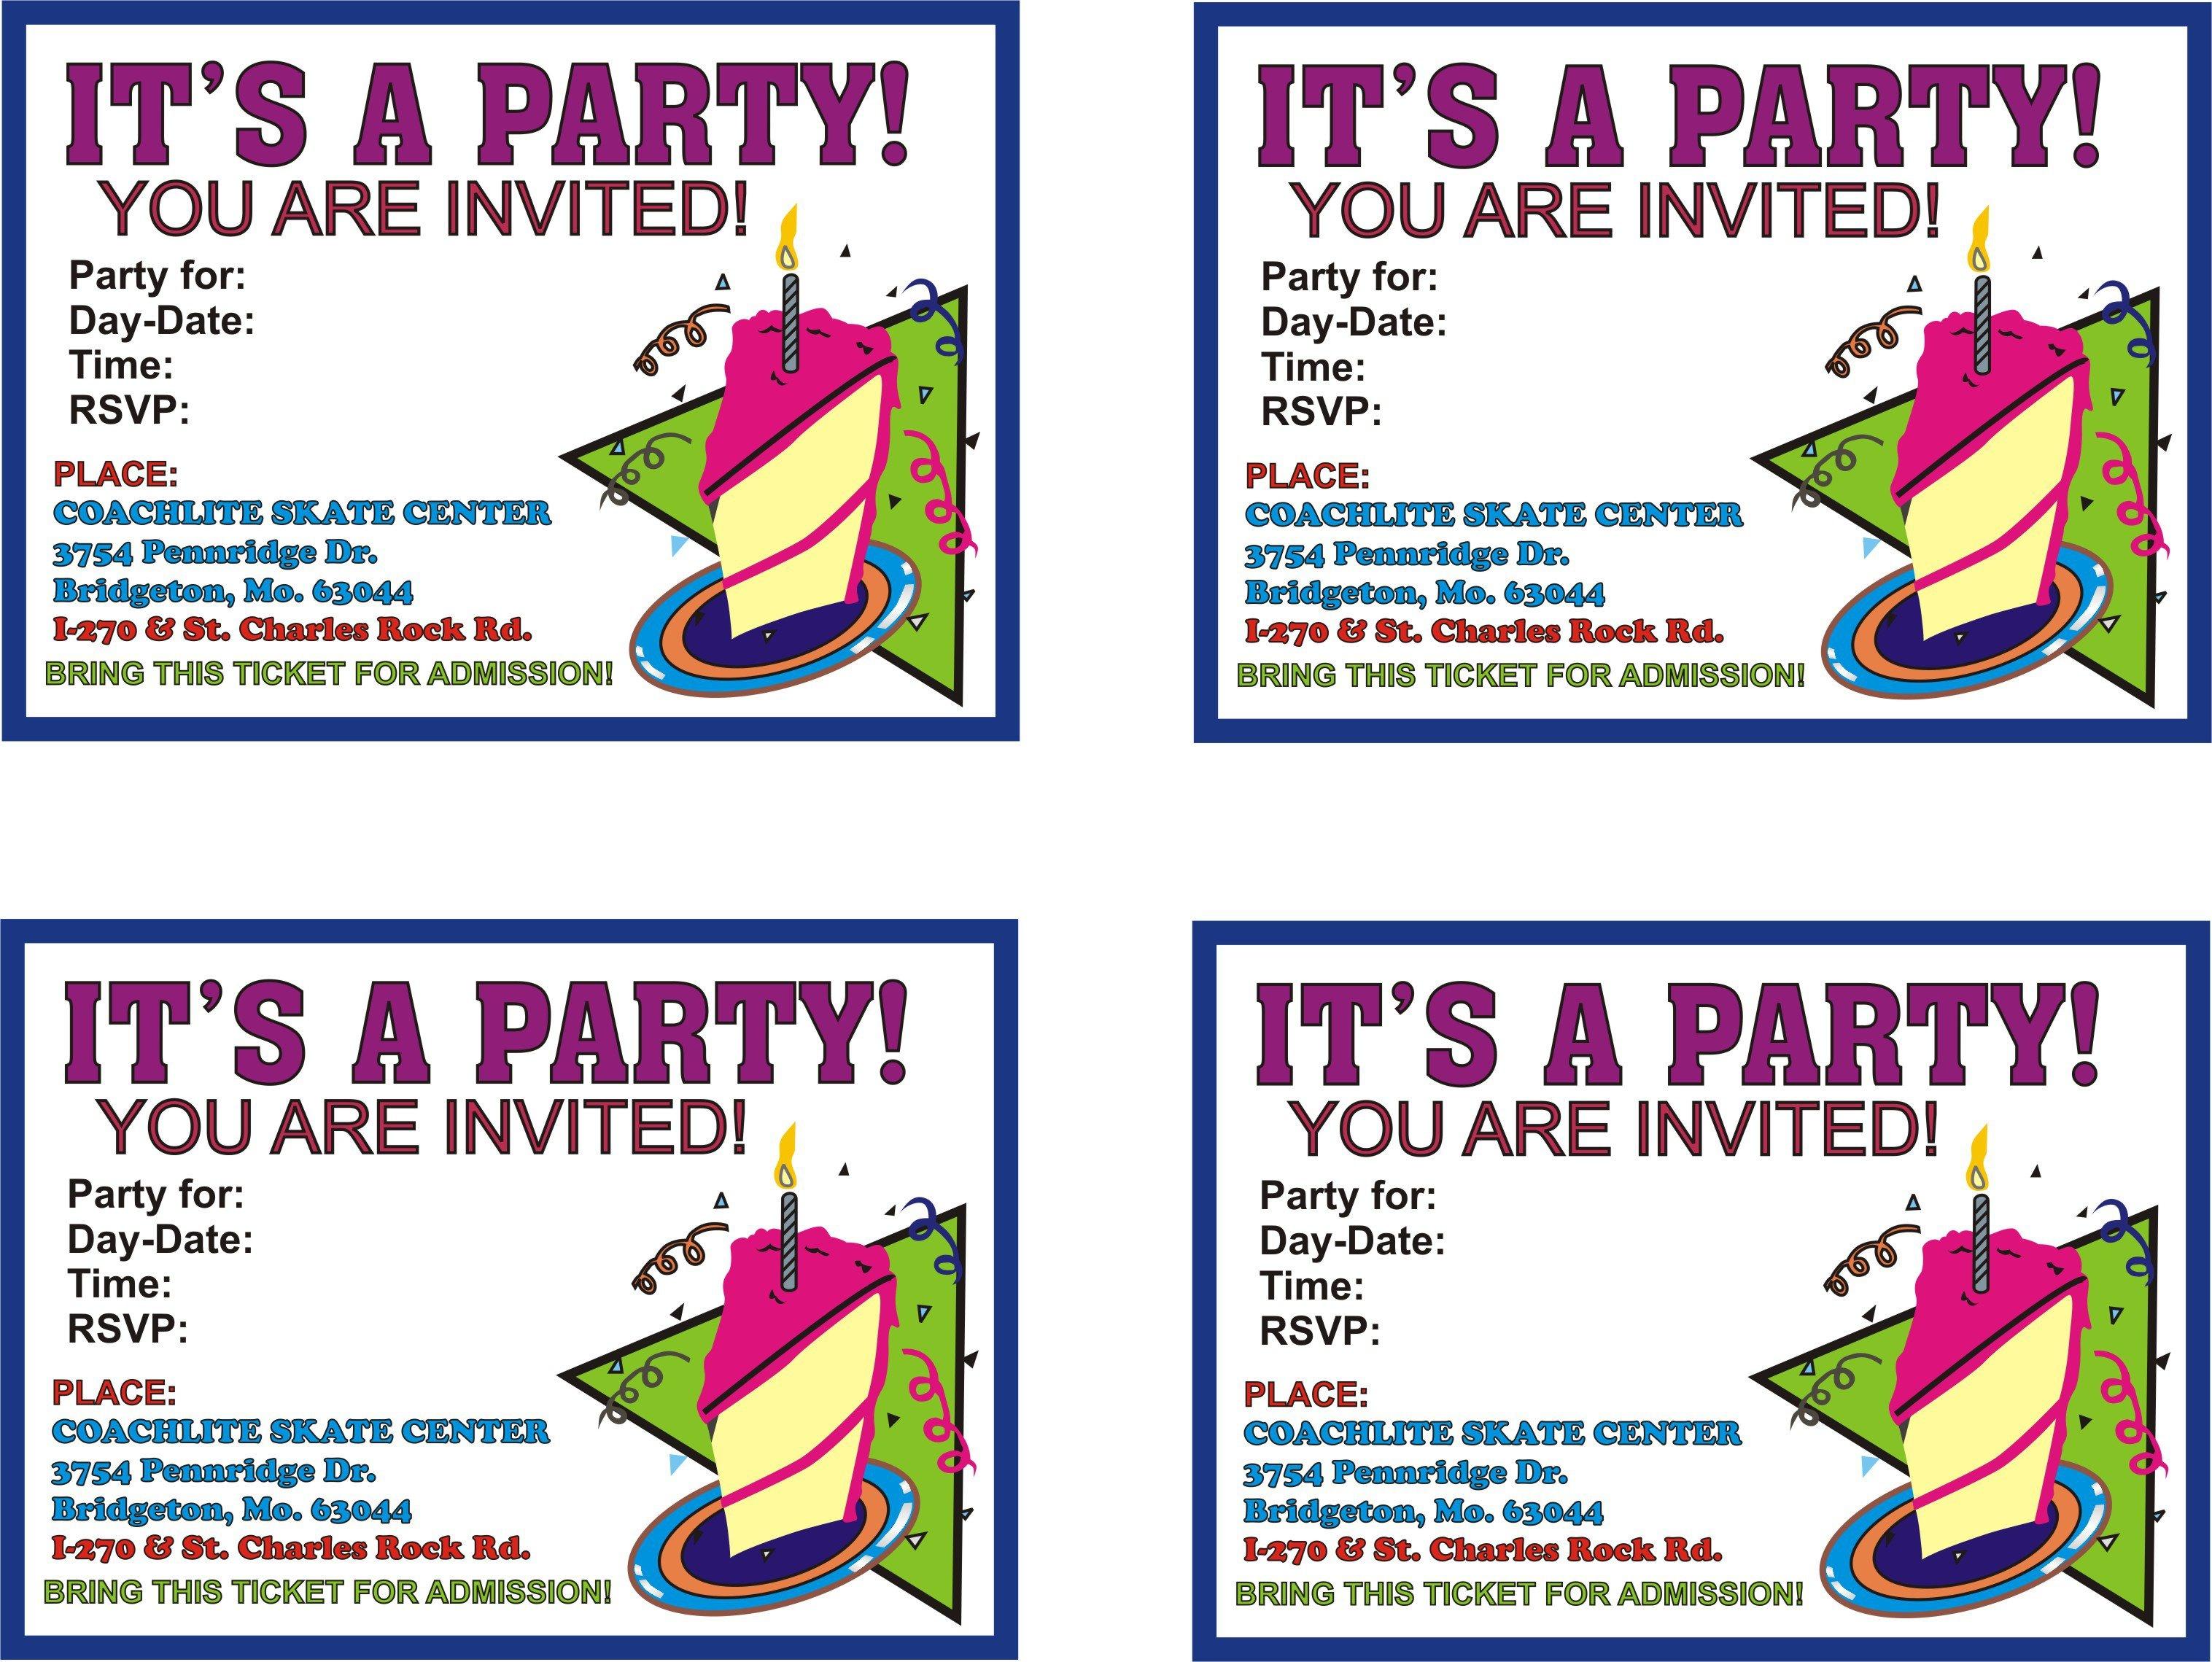 Printed Party Invitations Online - Tutlin.psstech.co - Birthday Party Invitations Online Free Printable